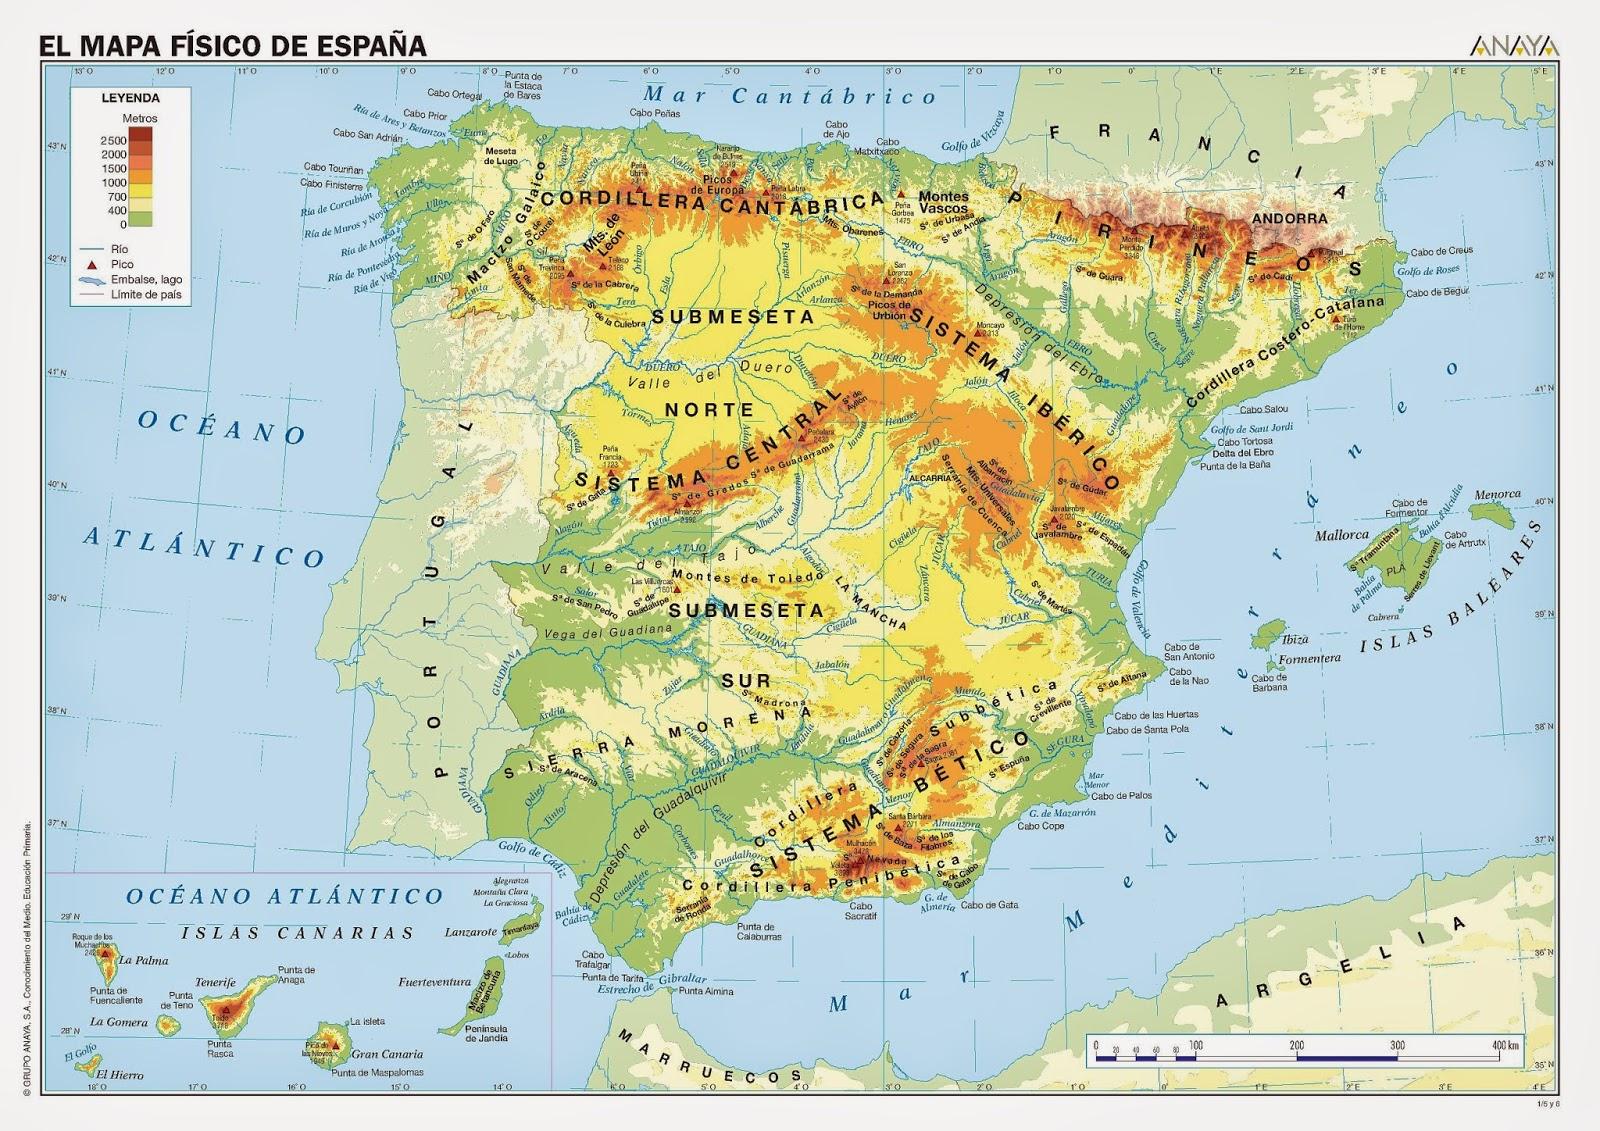 mapa fisico da peninsula iberica Mapa Físico Península Ibérica   GEOGRAFÍA: Recursos Online mapa fisico da peninsula iberica